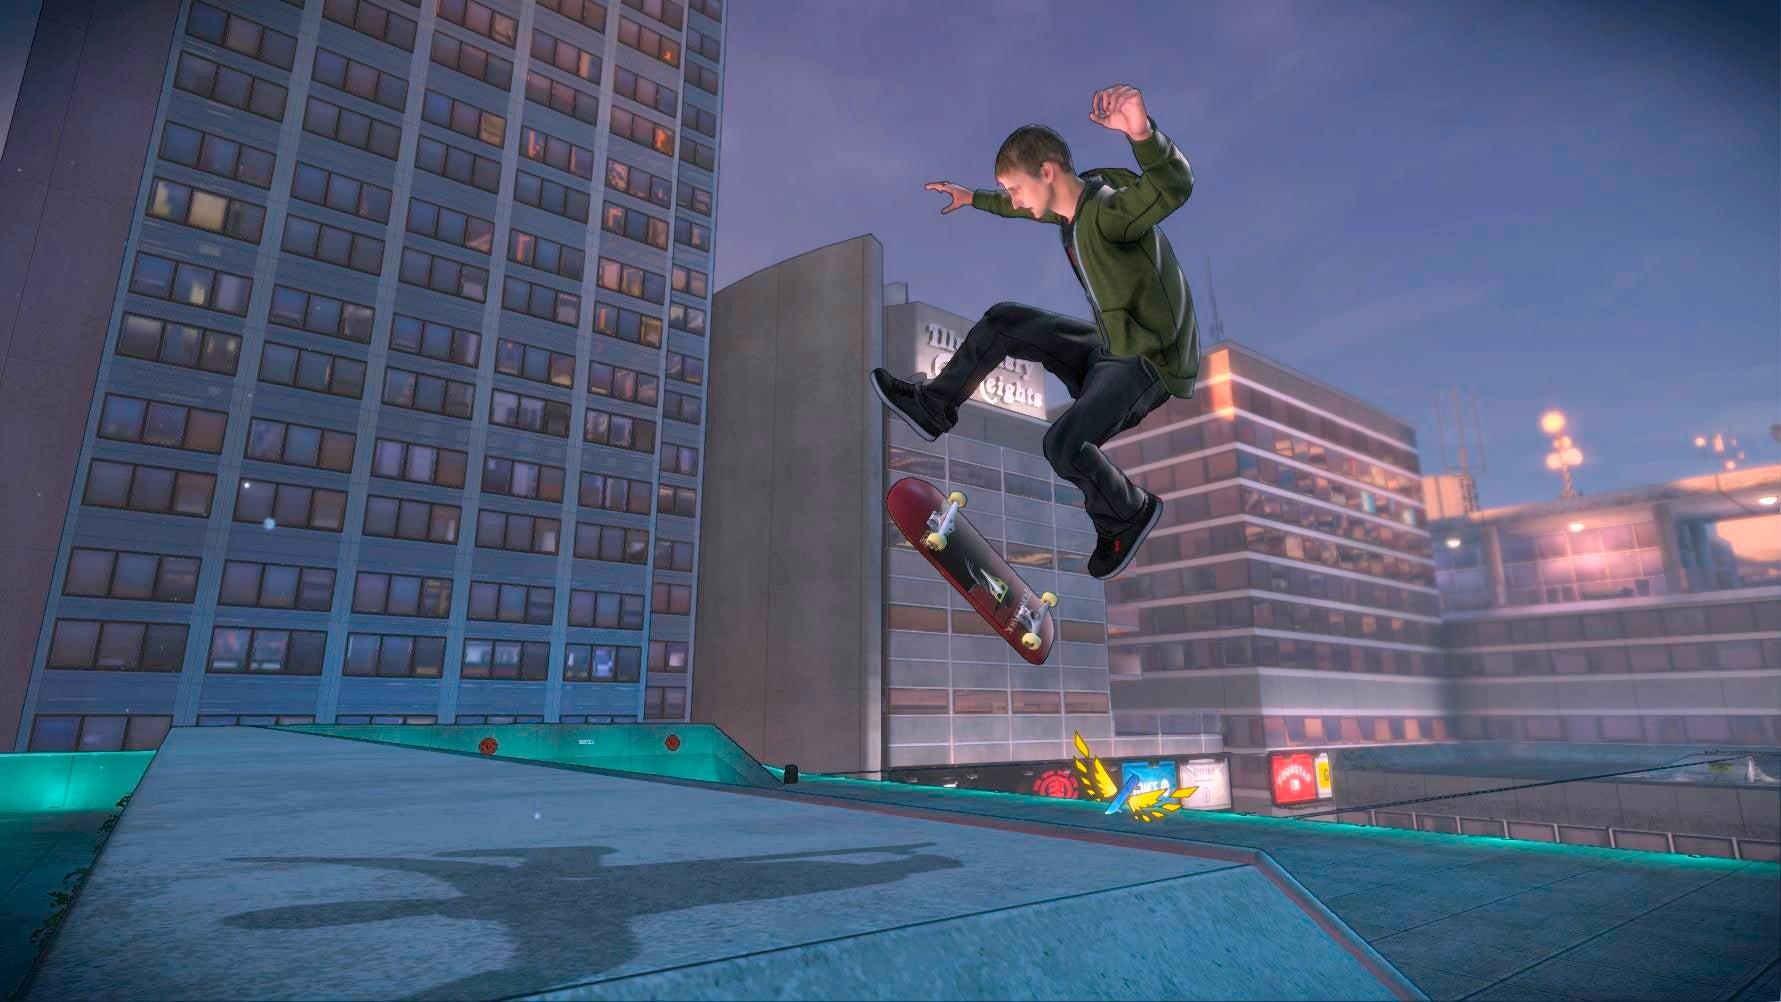 Image for Tony Hawk Pro Skater 5 reviews go live - critics shoot down The Birdman